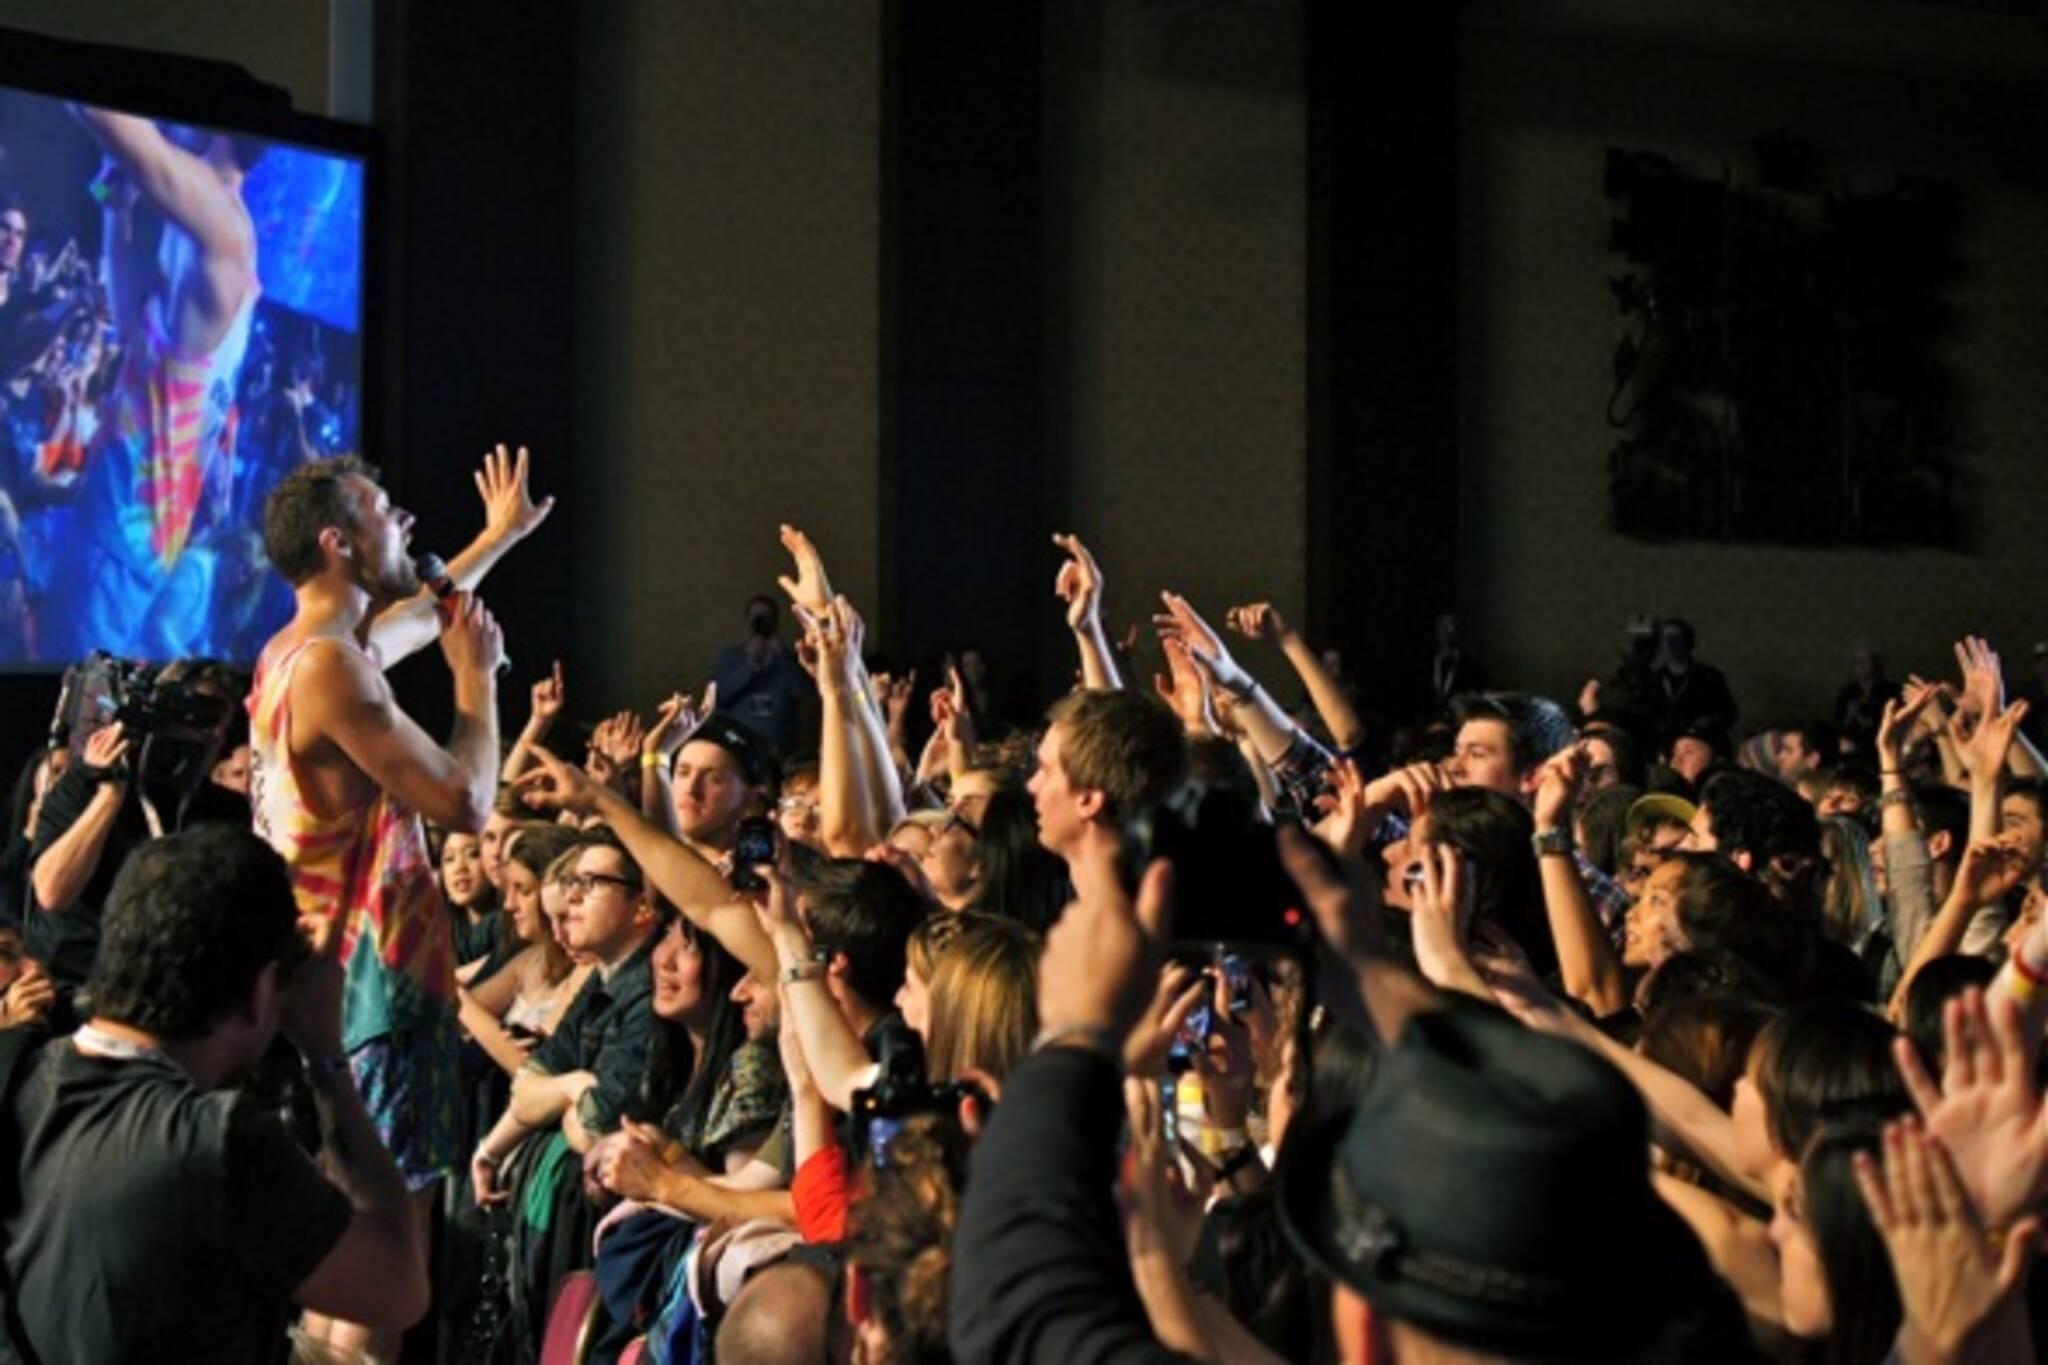 Toronto Concerts April 2013